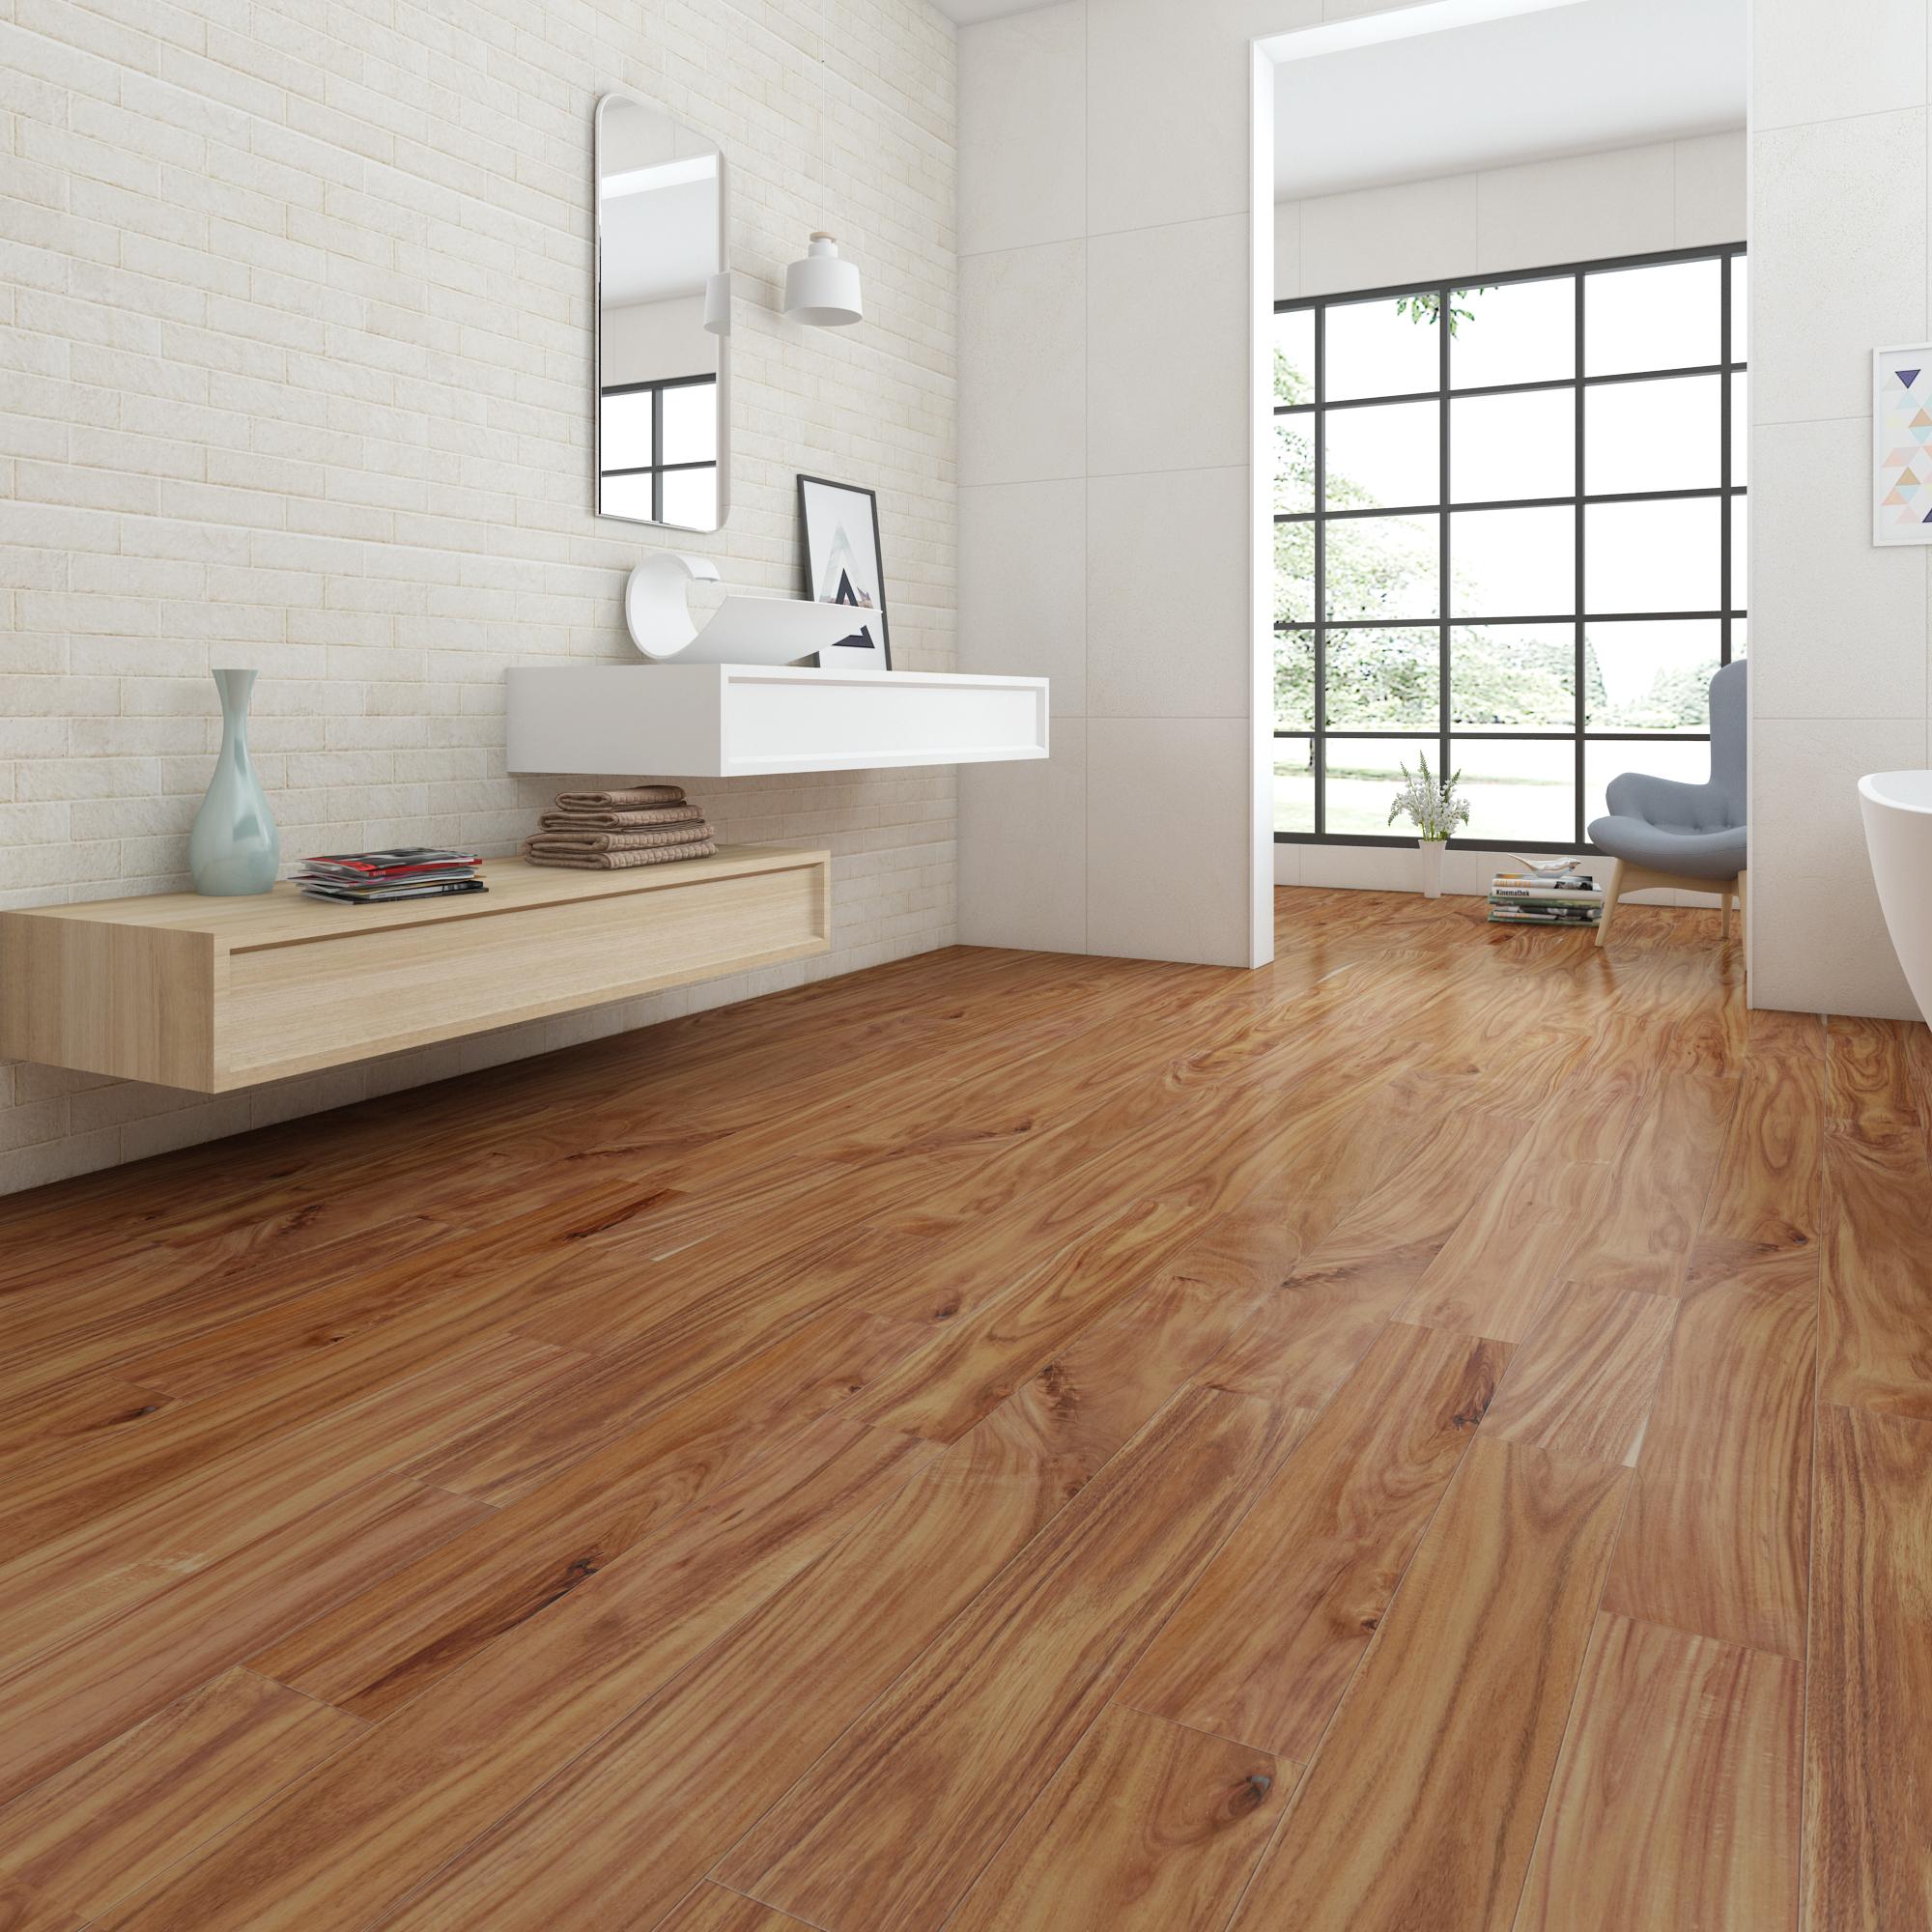 Acacia Natural_Bathroom 2.jpg